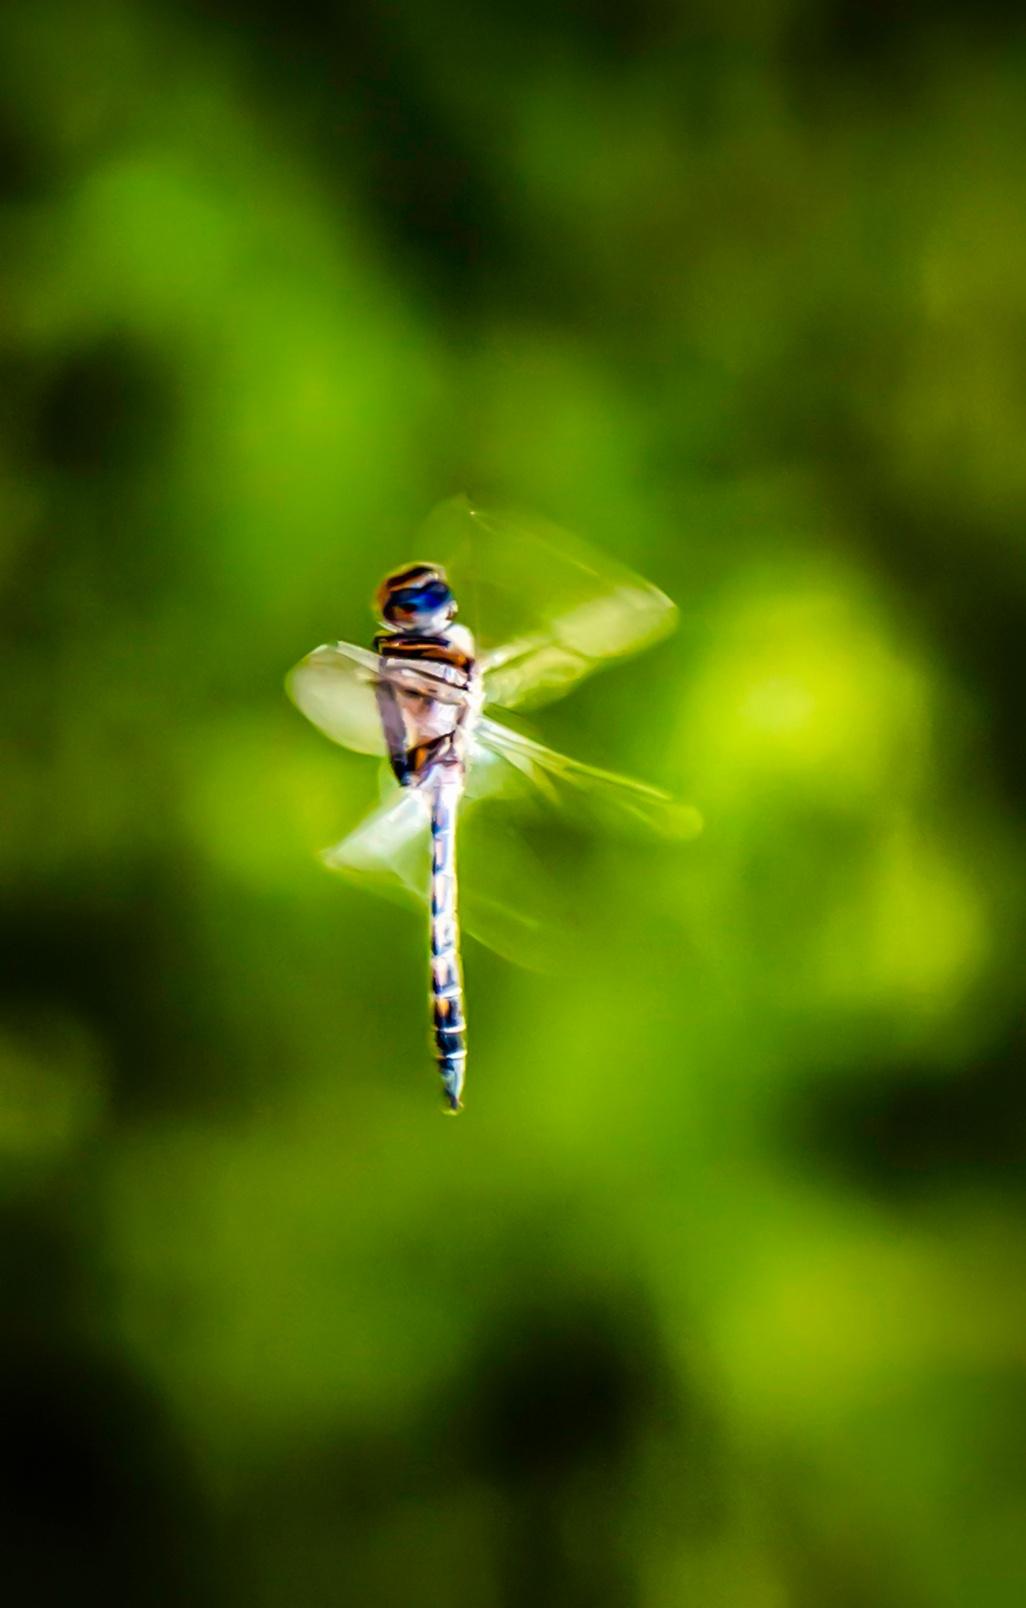 Dancing D Fly by RwBesler